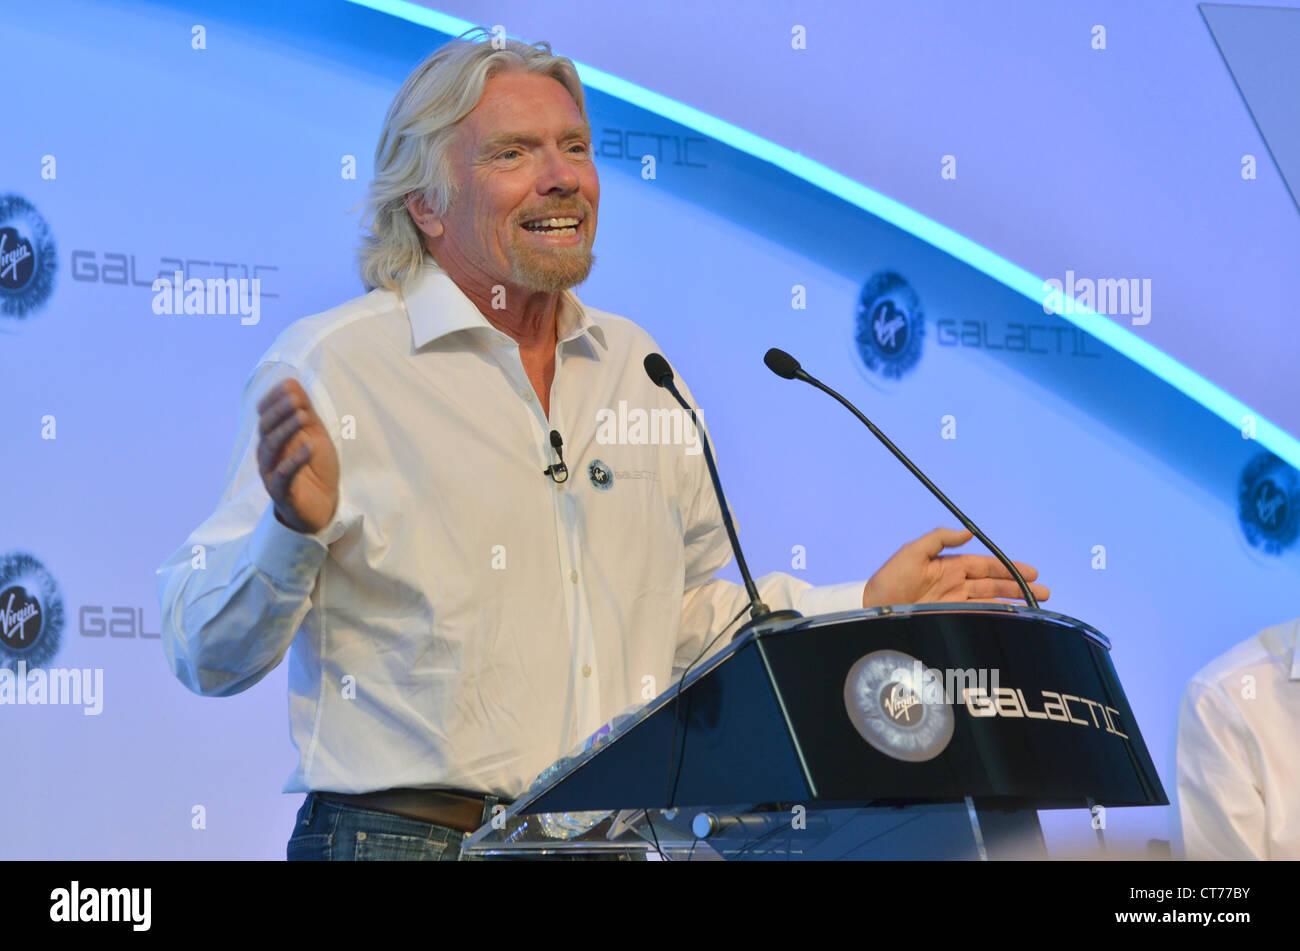 Sir Richard Branson, Founder of Virgin Galactic, at the Farnborough Airshow 2012. - Stock Image